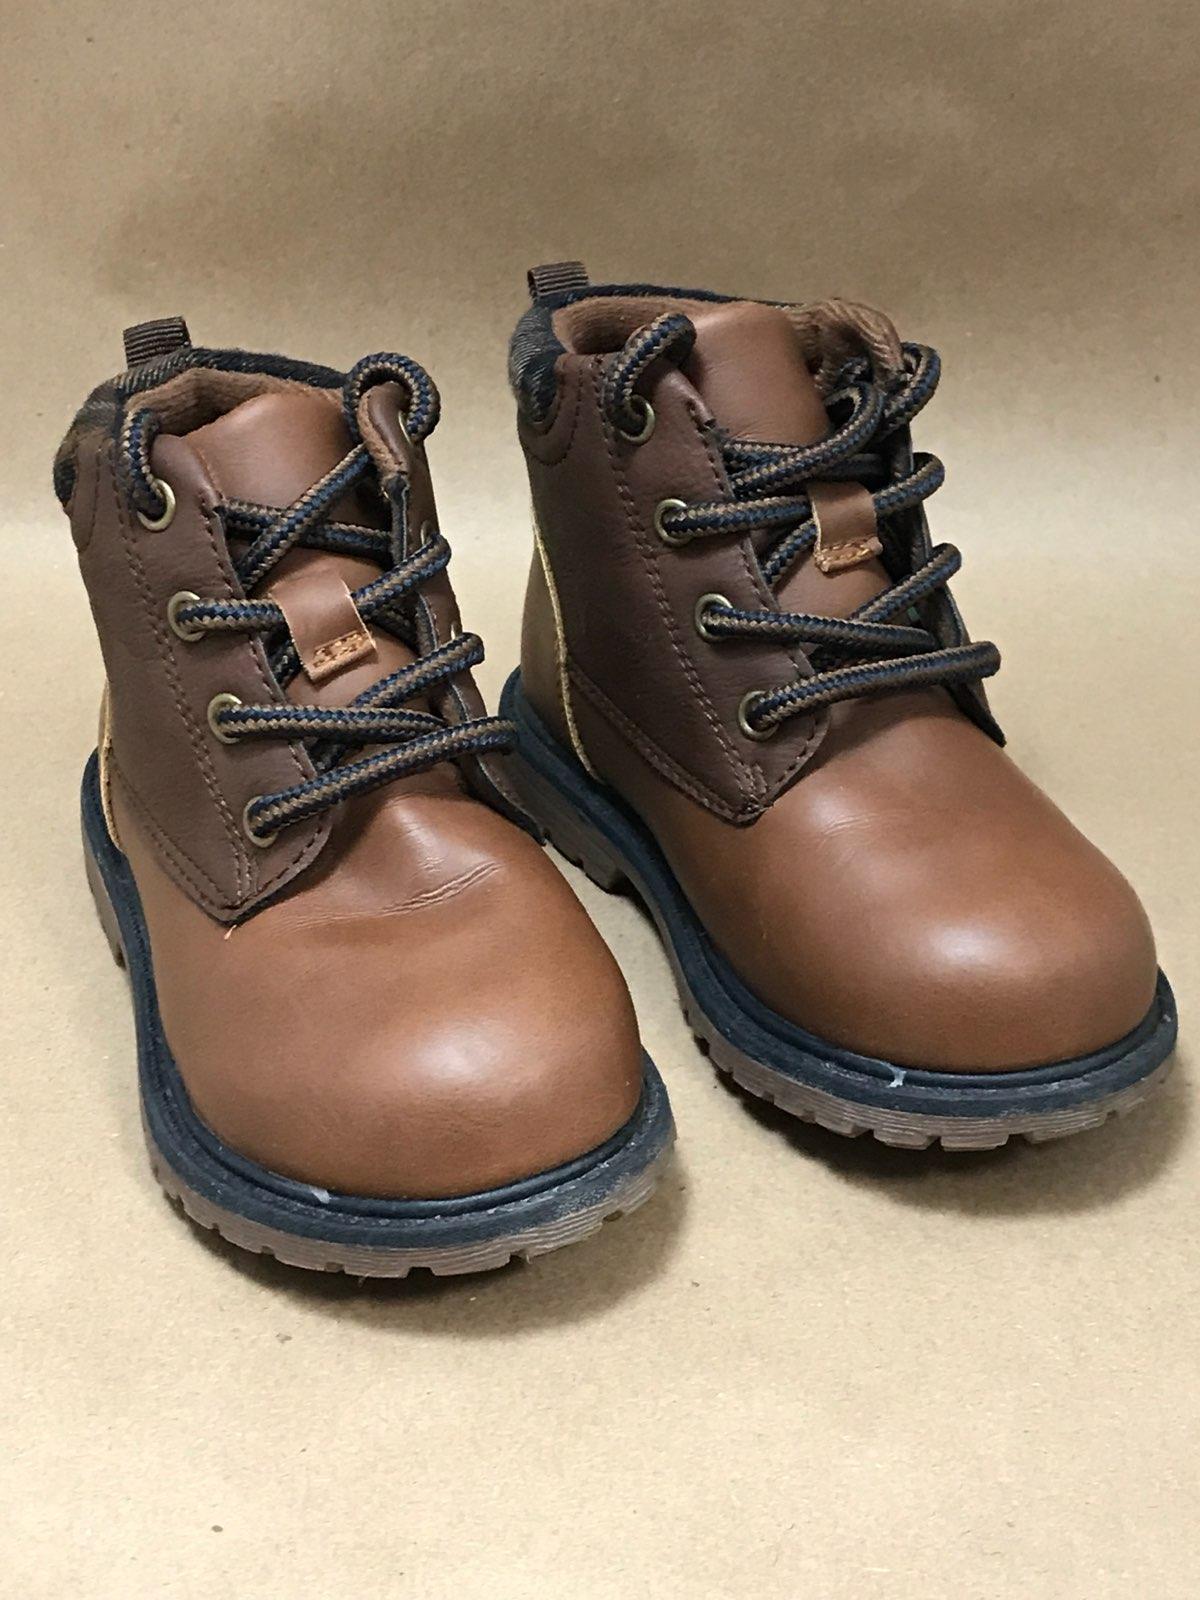 1da803e4a39d Oshkosh brown toddler boots Size 7 - Mercari  The Selling App